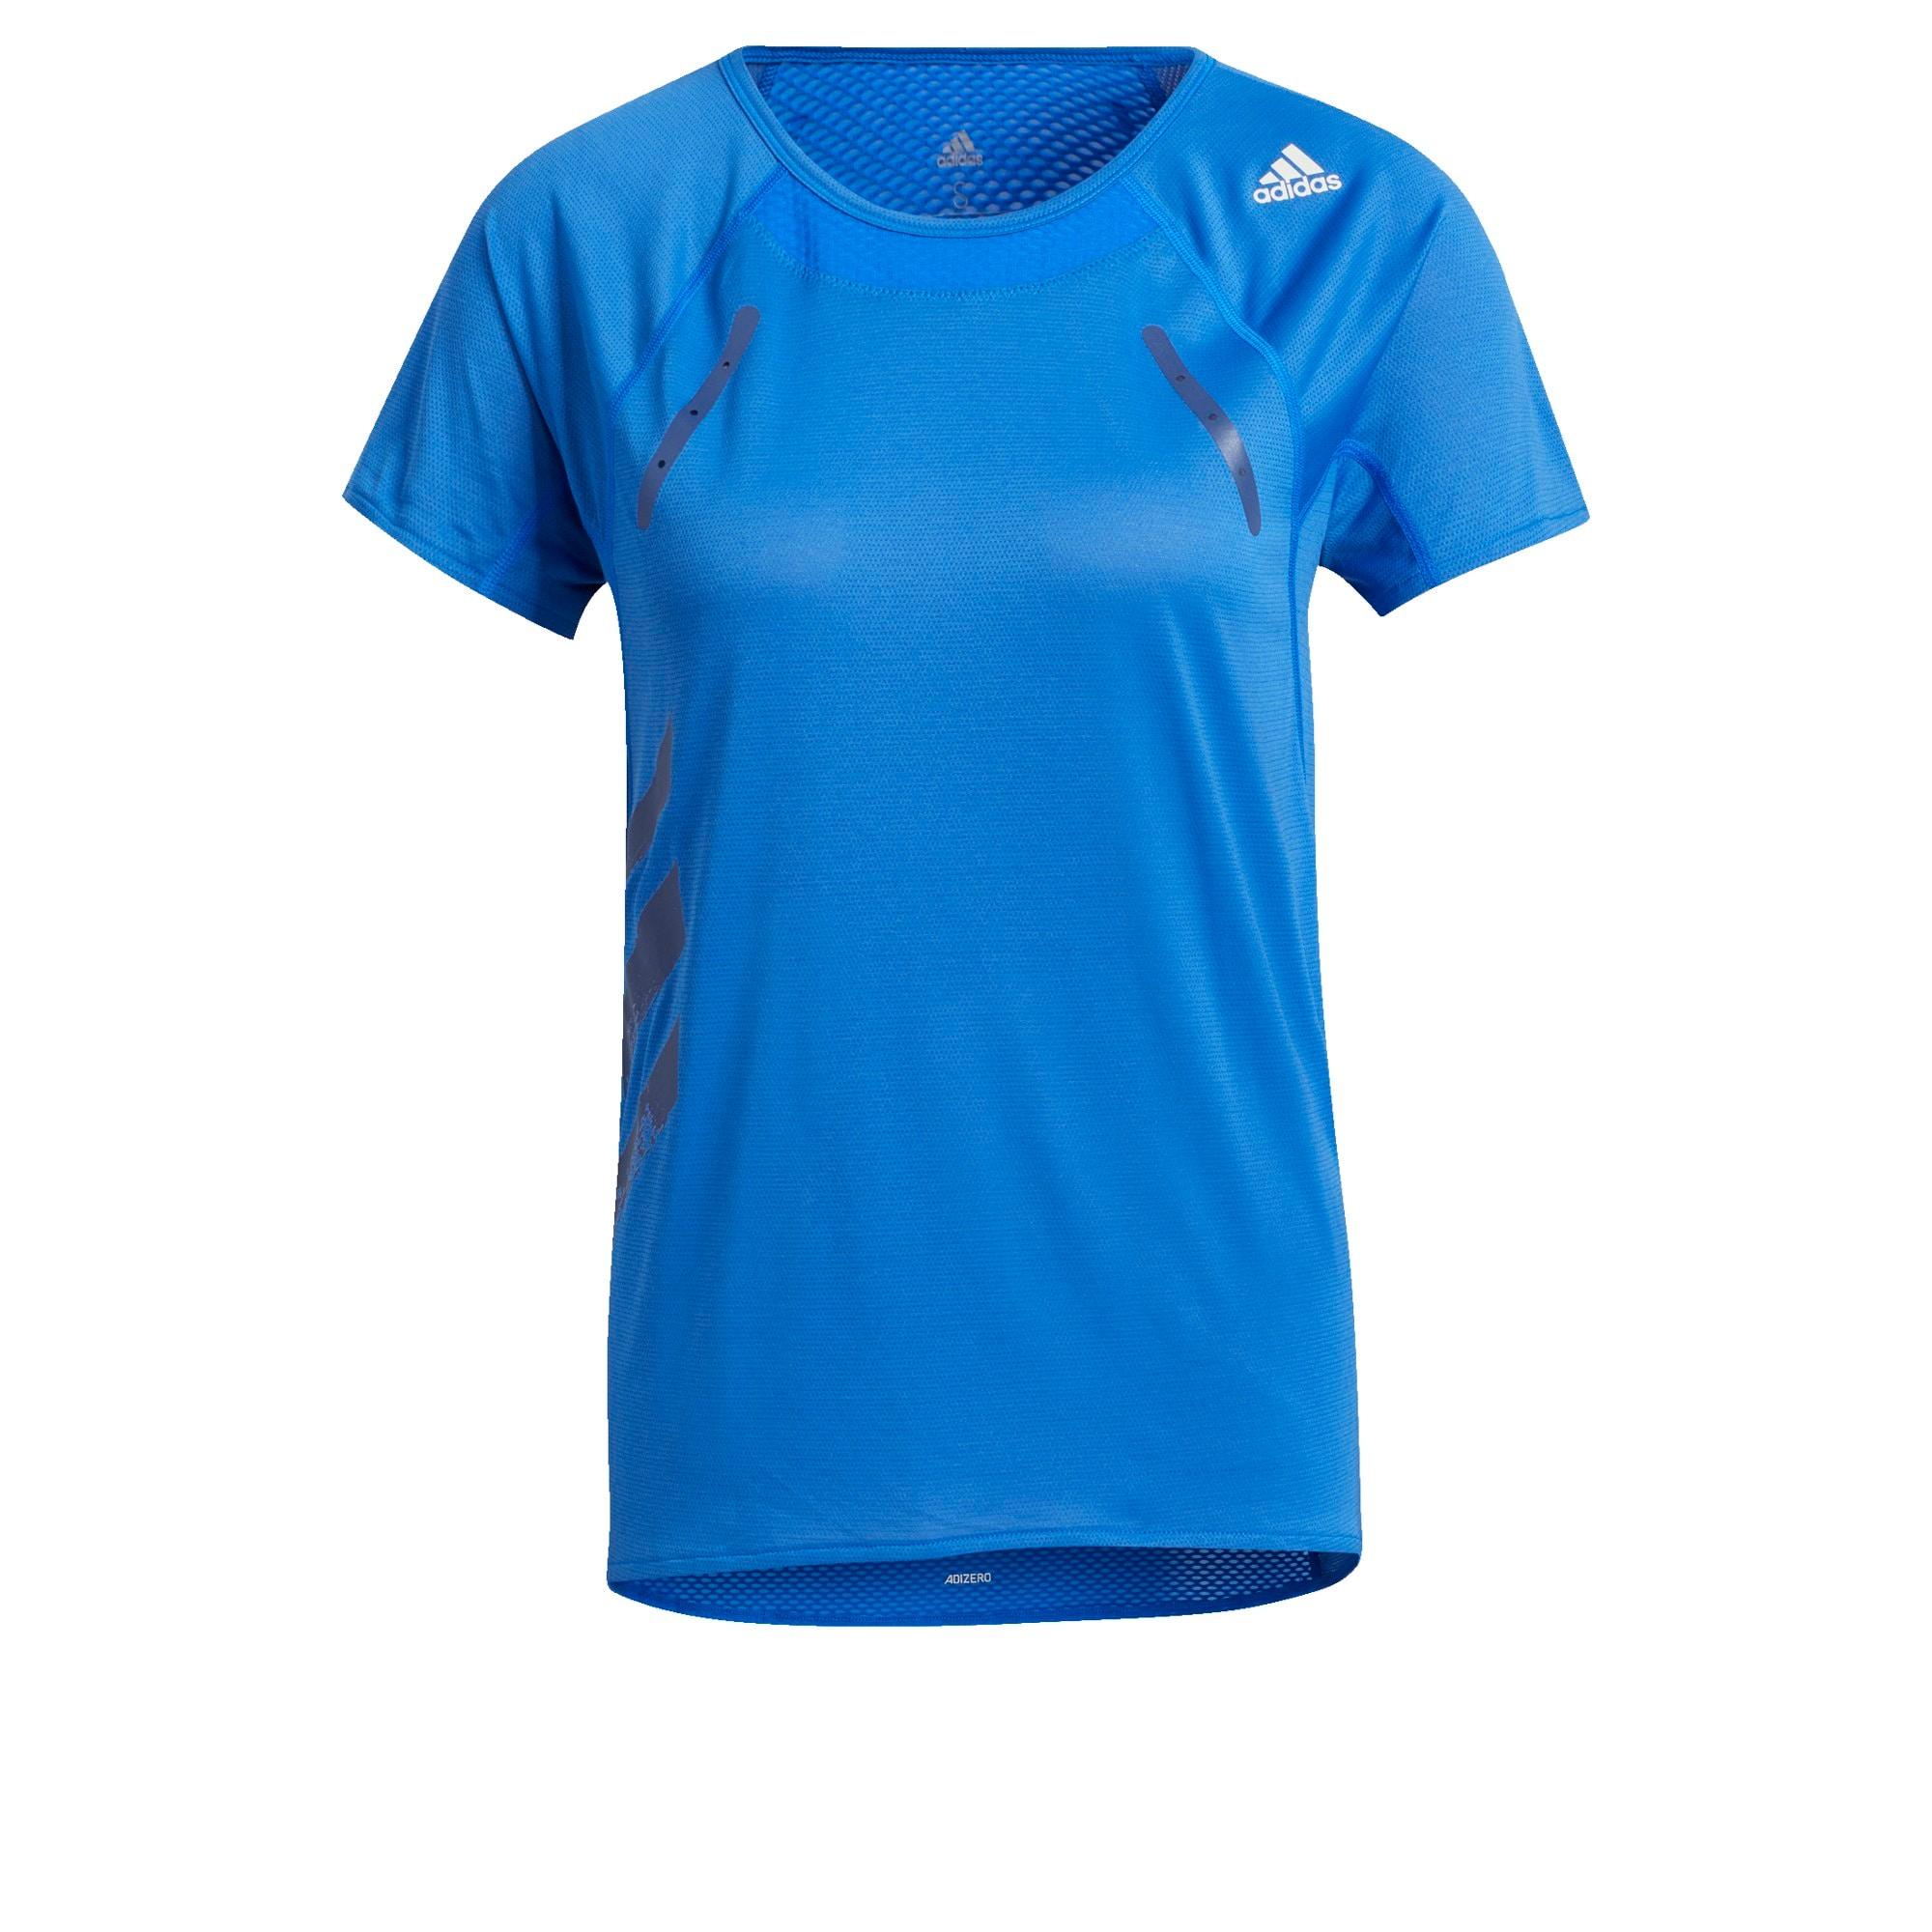 ADIDAS PERFORMANCE Funkční tričko  bílá / modrá / šedá